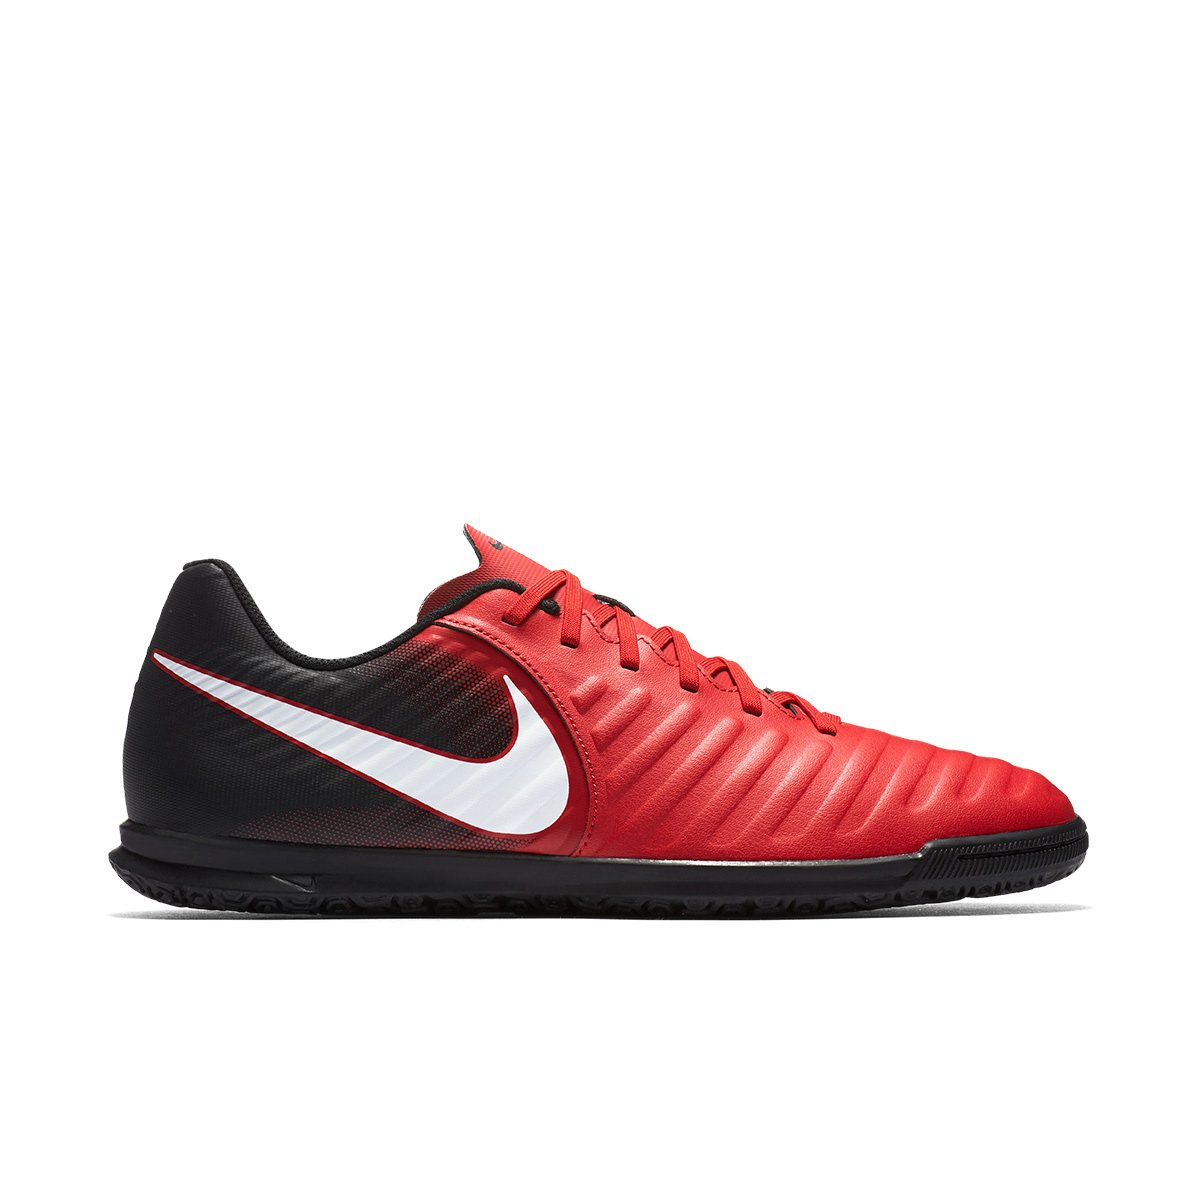 27fcce4c90 Chuteira Futsal Nike Tiempo Rio 4 IC - Compre Agora